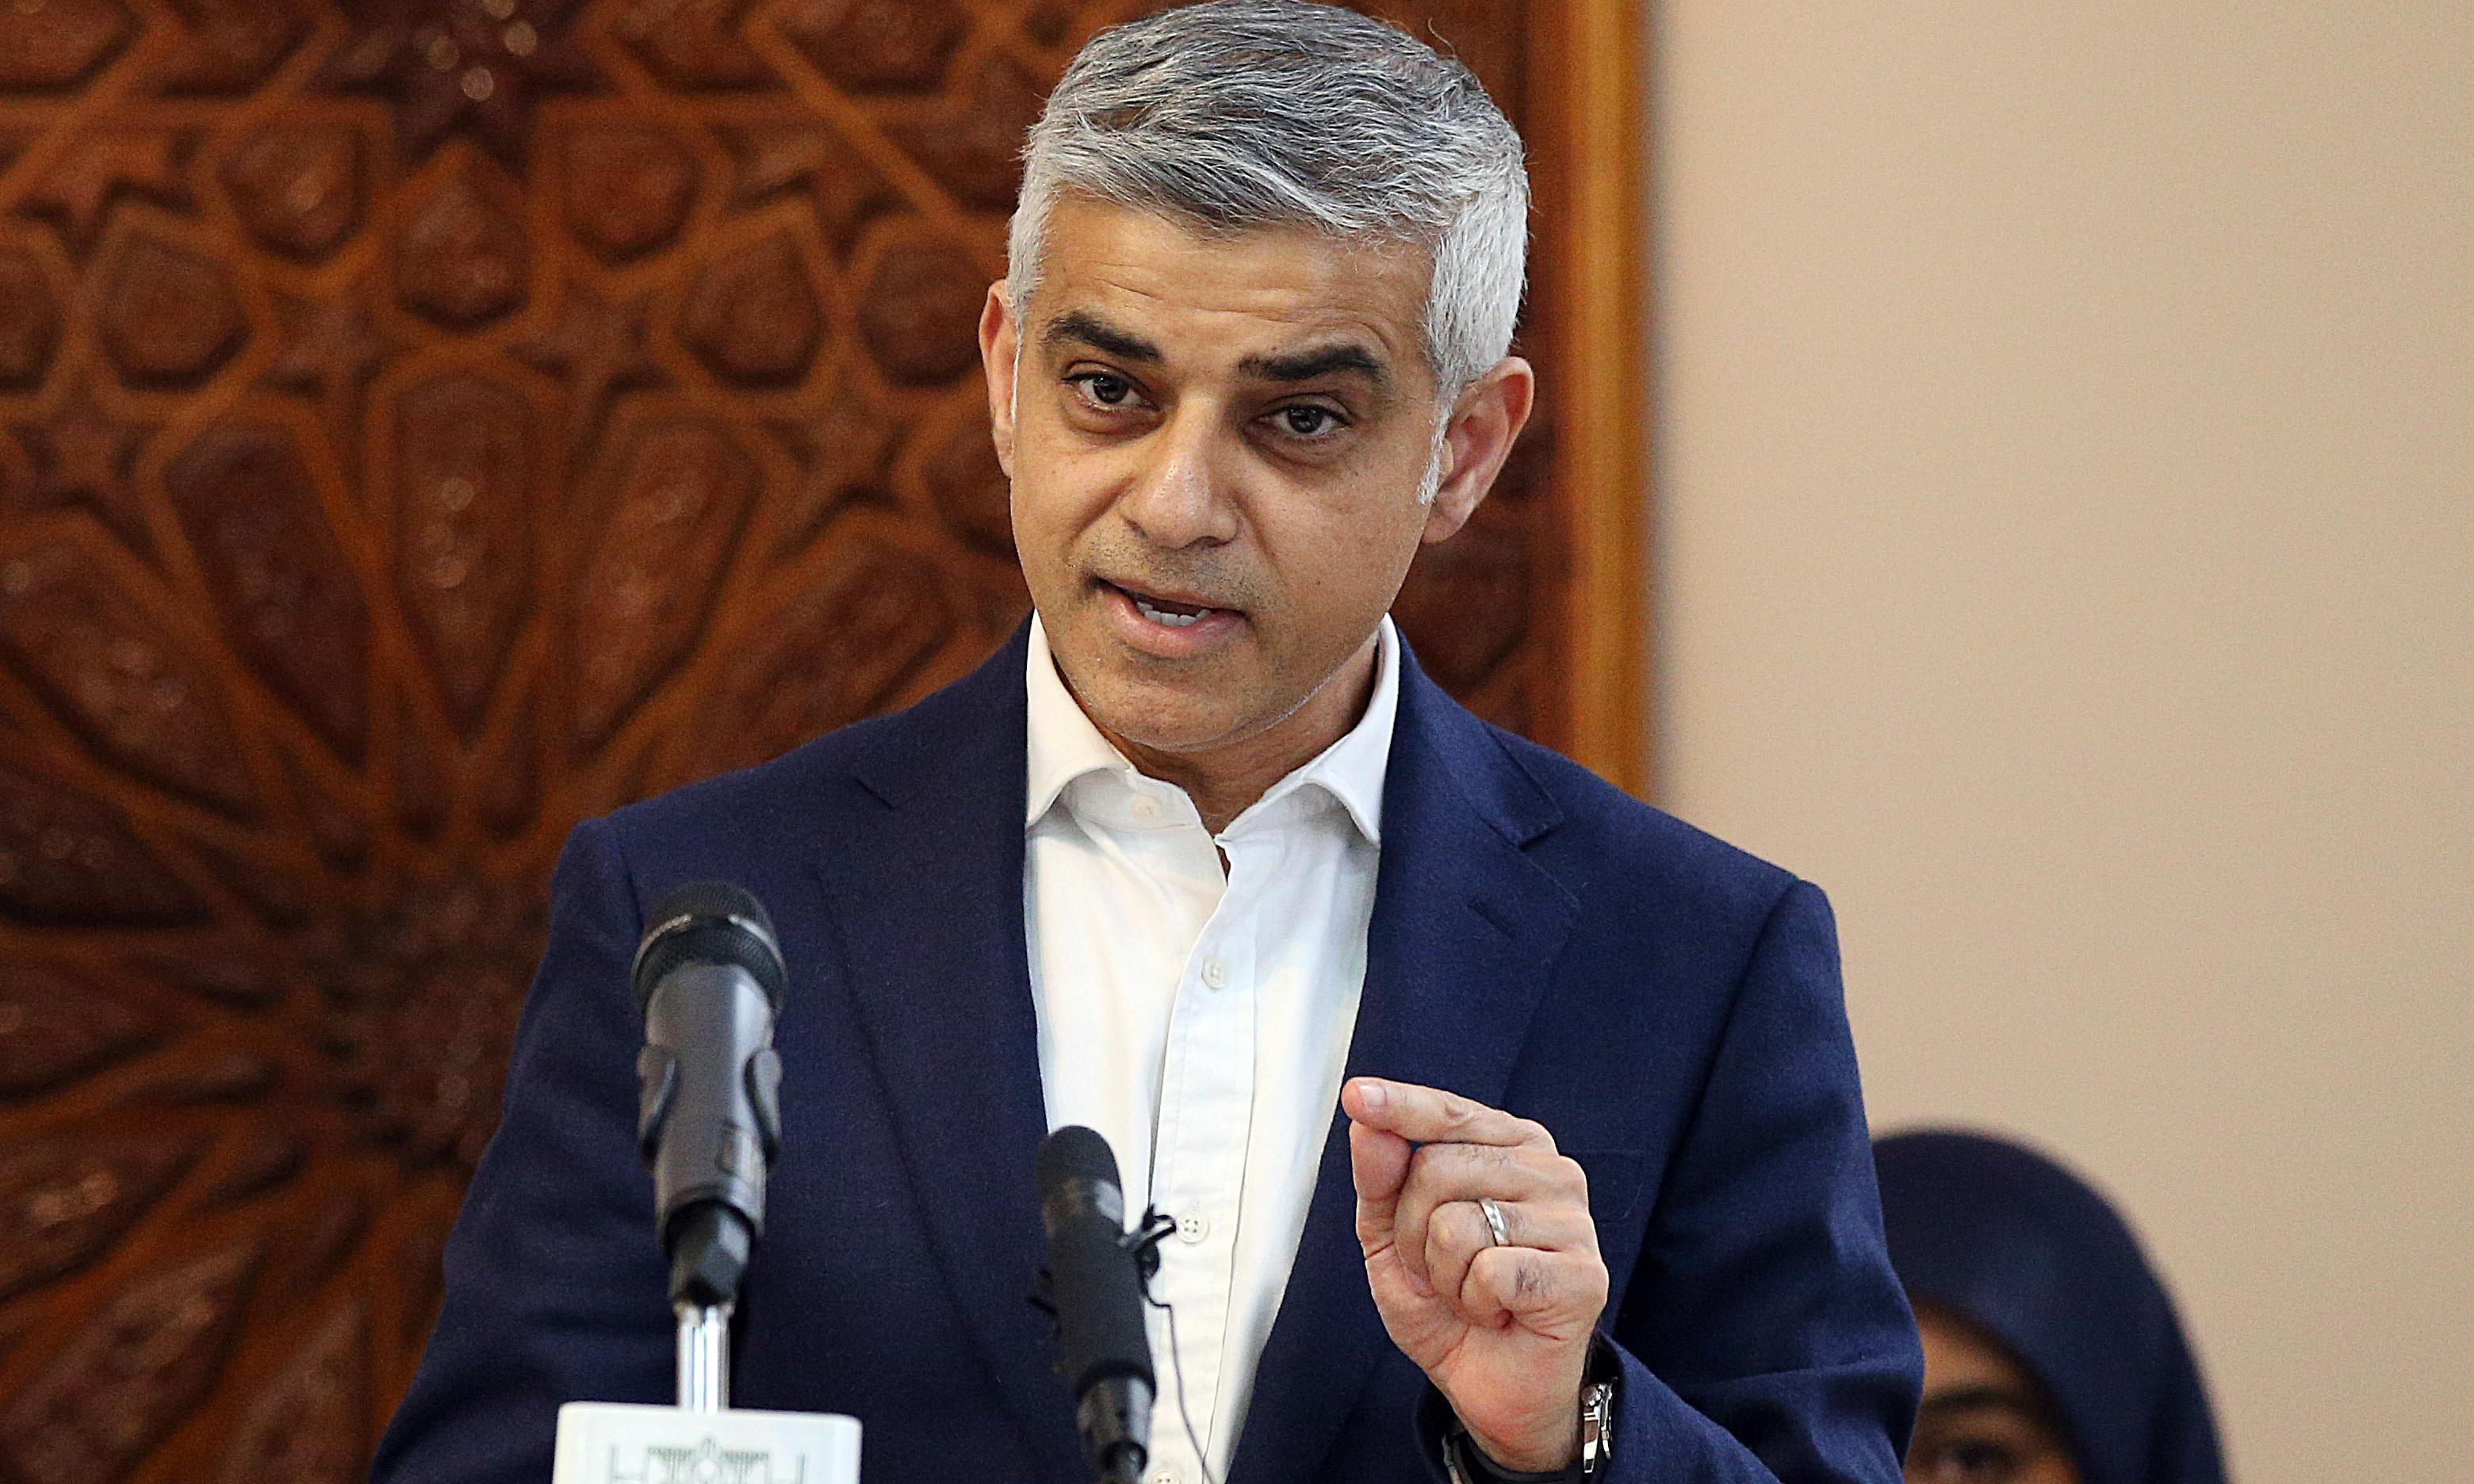 Sadiq Khan calls for new powers to impose London rent controls